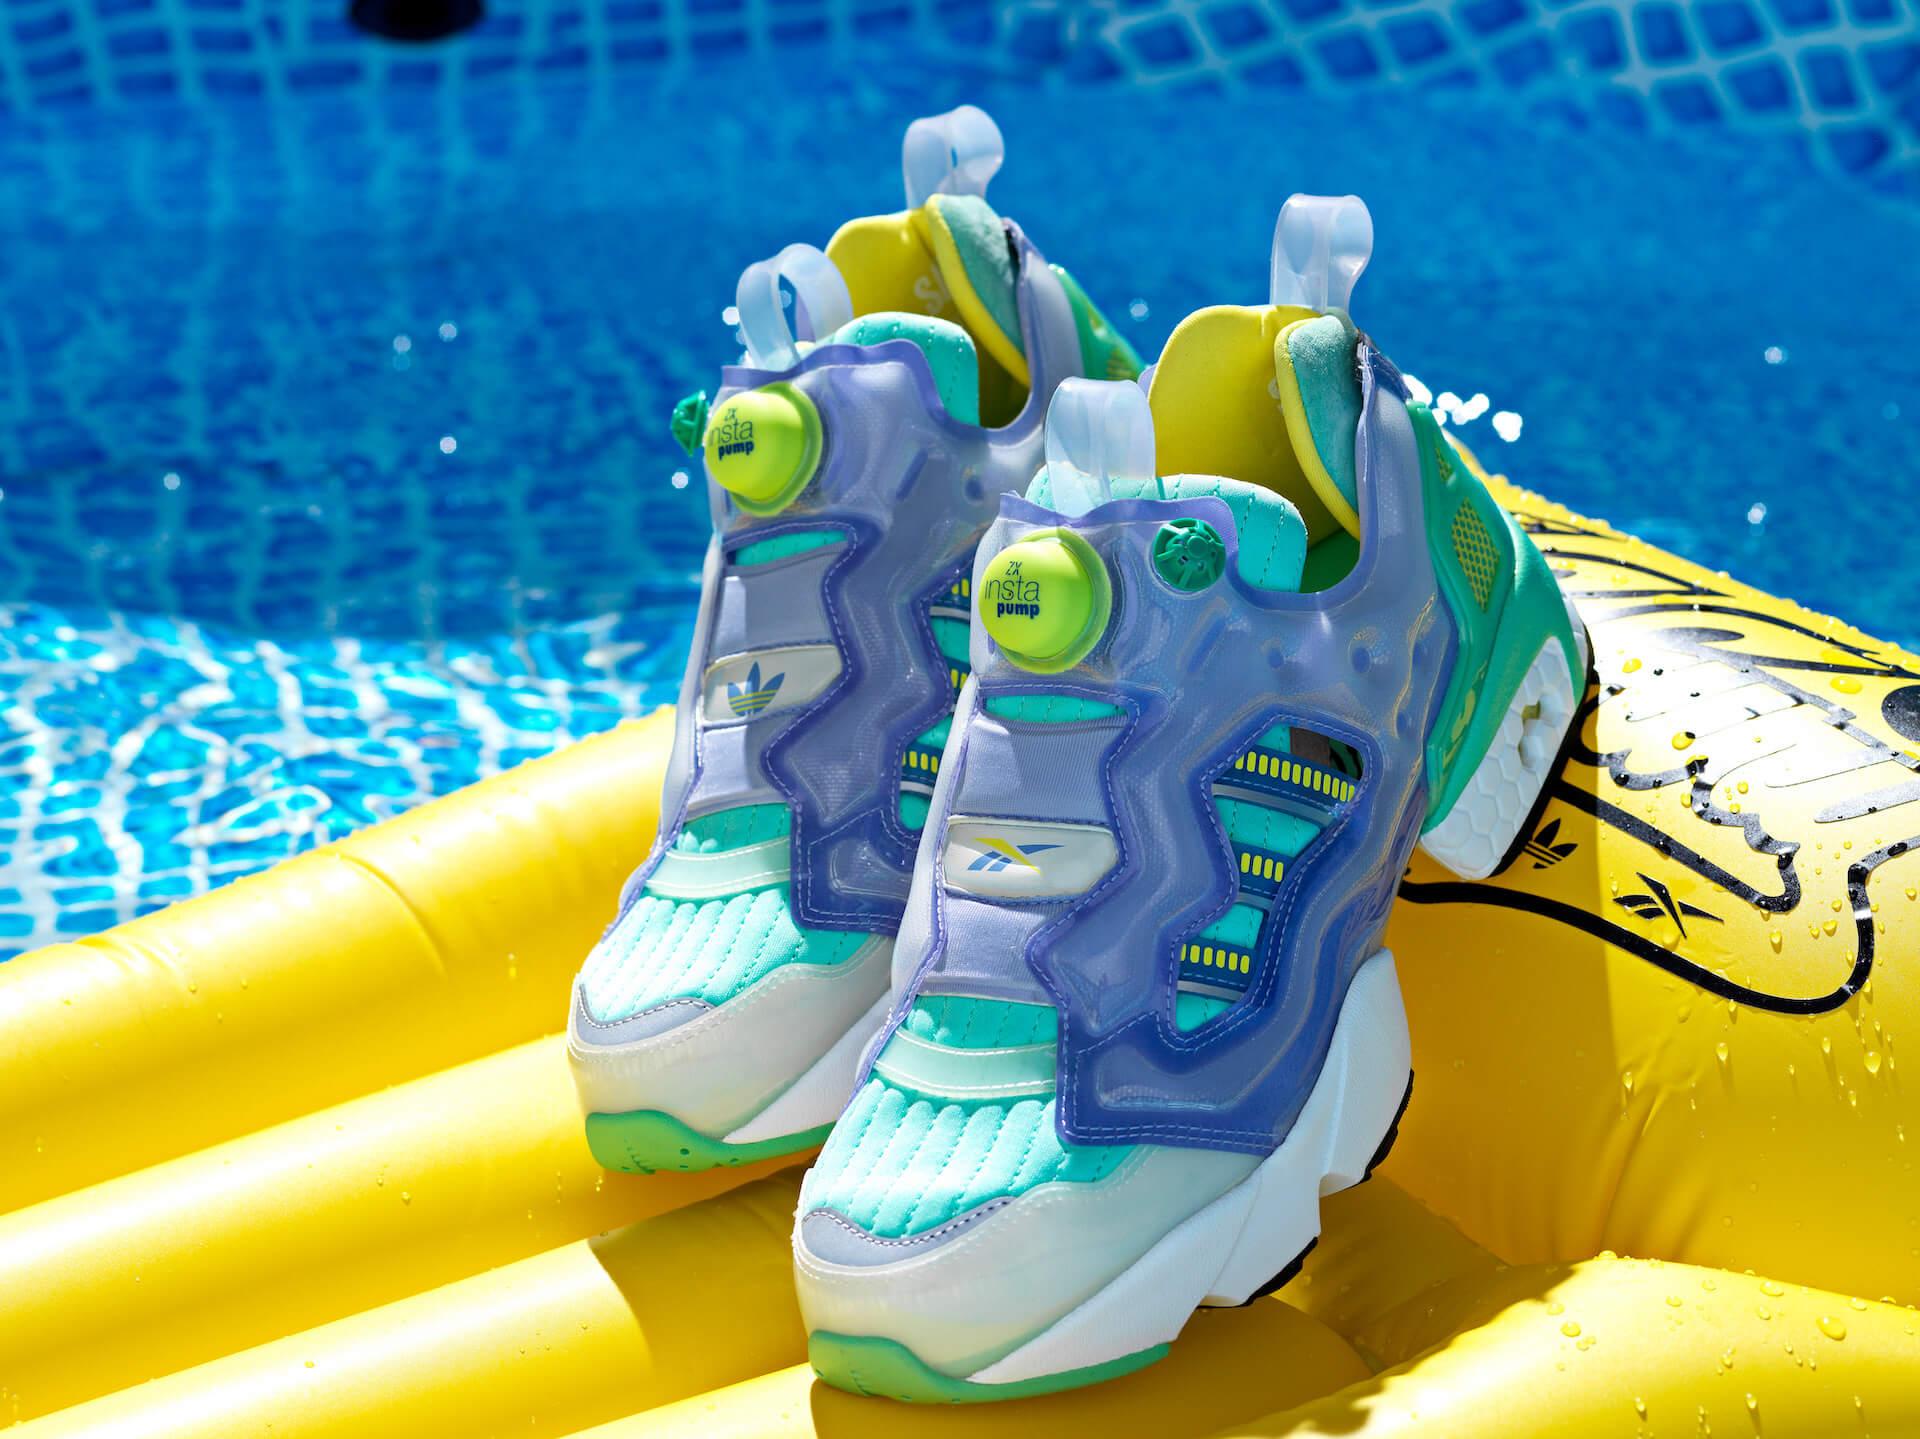 adidas OriginalsとReebokのコラボモデル「ZX FURY」に夏にぴったりの新色4色が登場! life210719_adidasoriginals_reebok_9